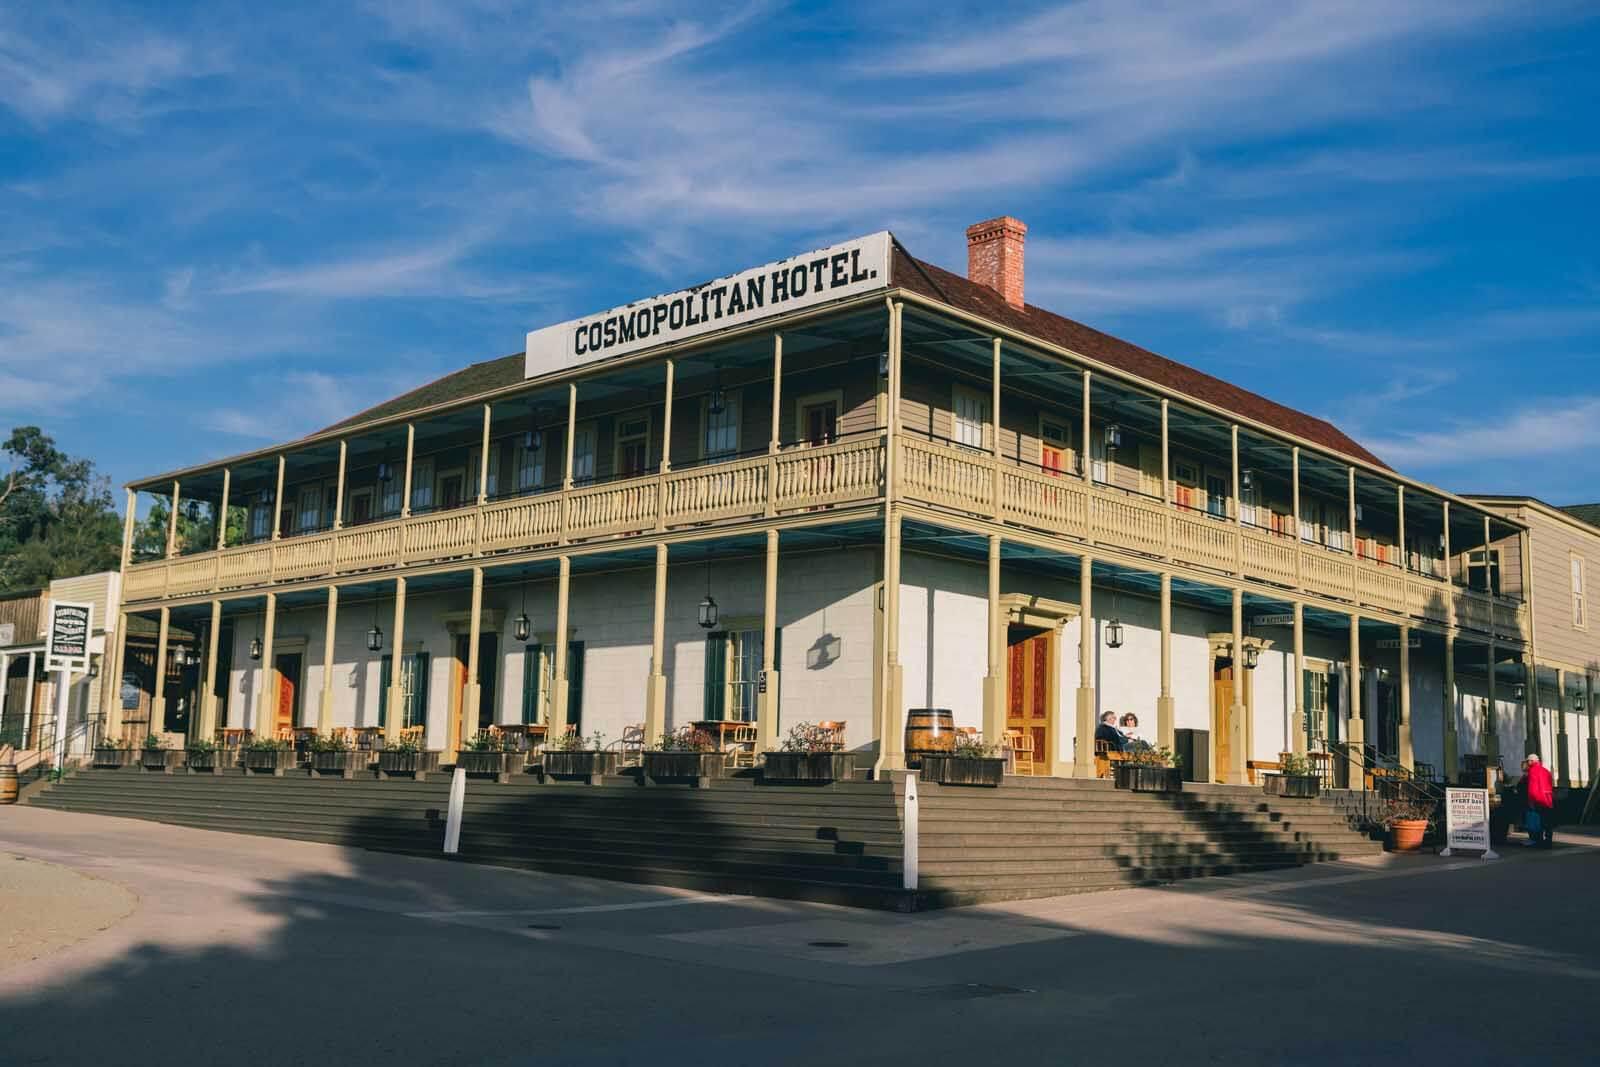 Cosmopolitan Hotel in Old Town San Diego